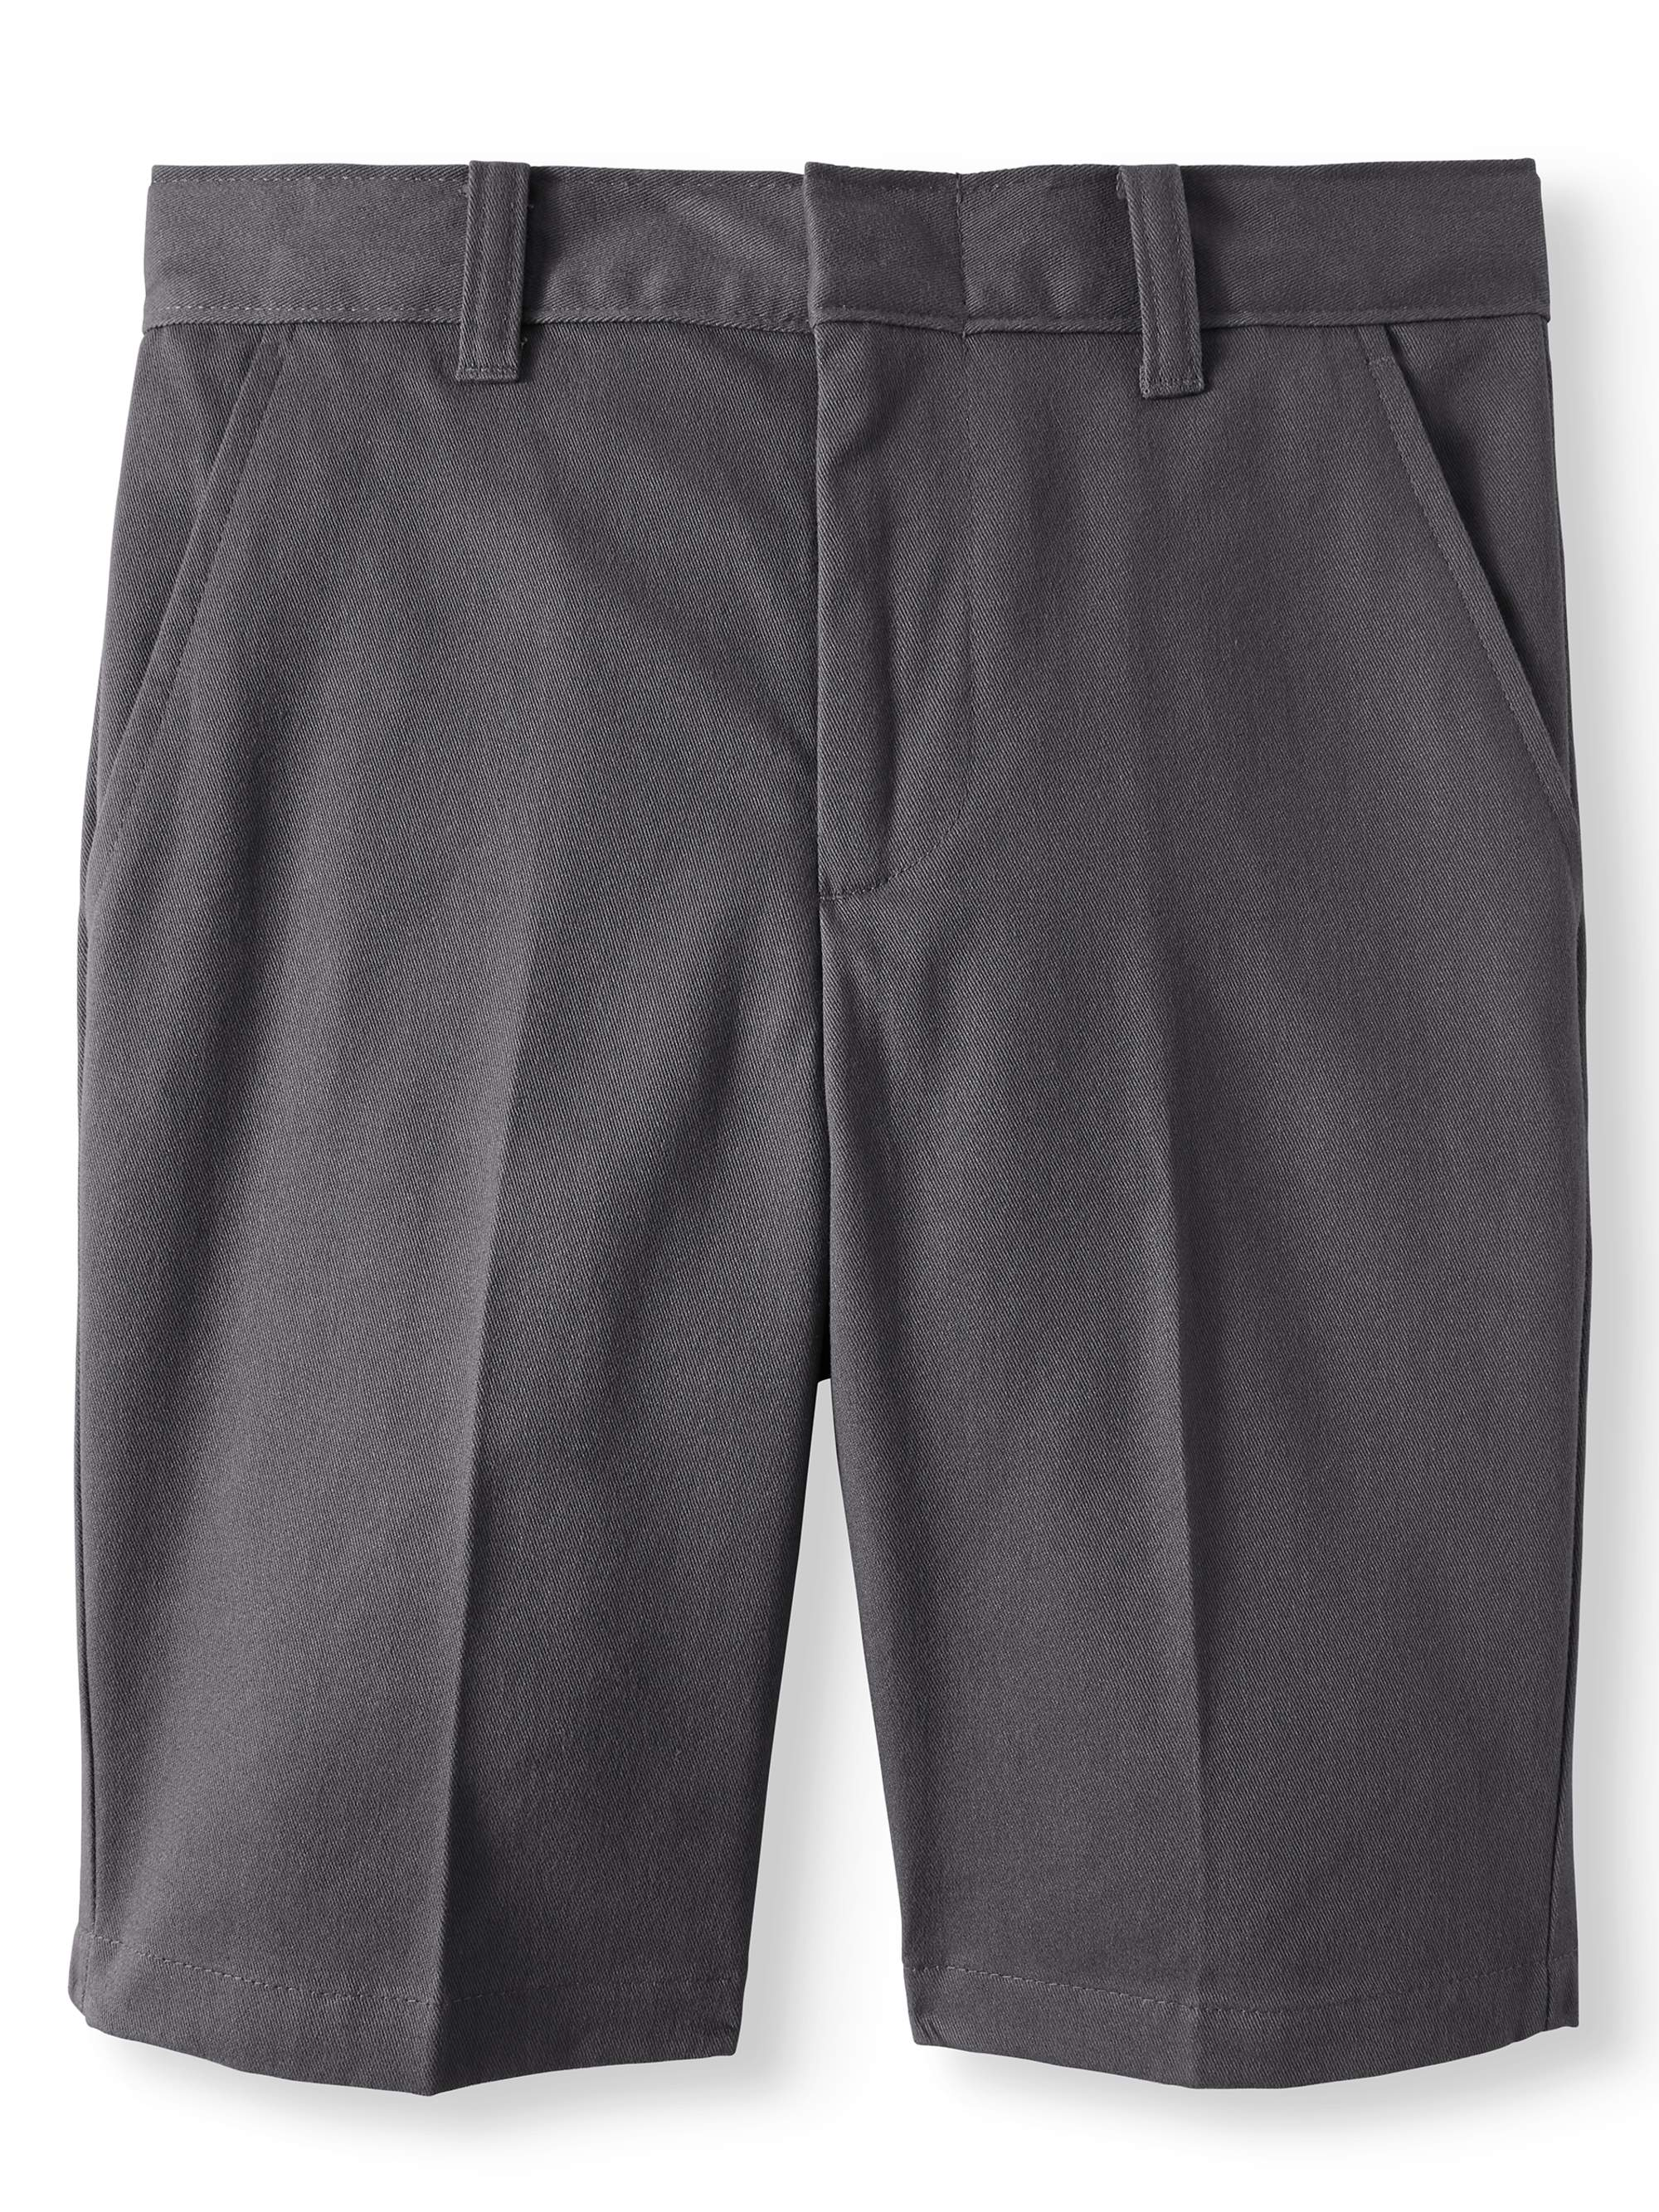 Boys School Uniforms Flat Front Shorts